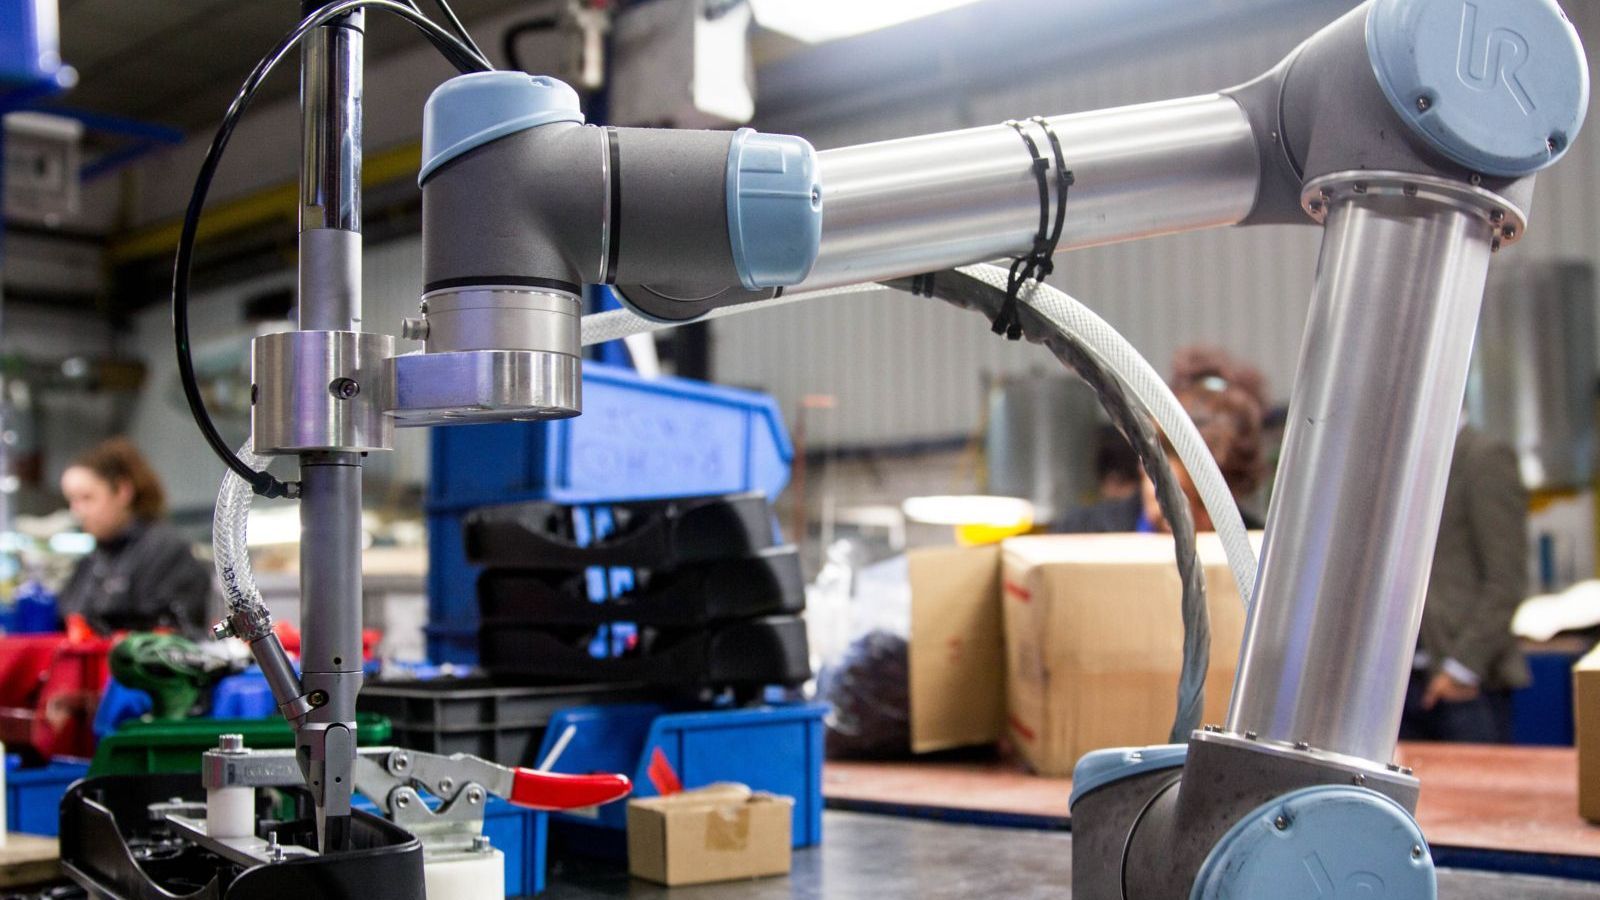 Fanuc Robotics, UK - IFR Partner - International Federation of Robotics